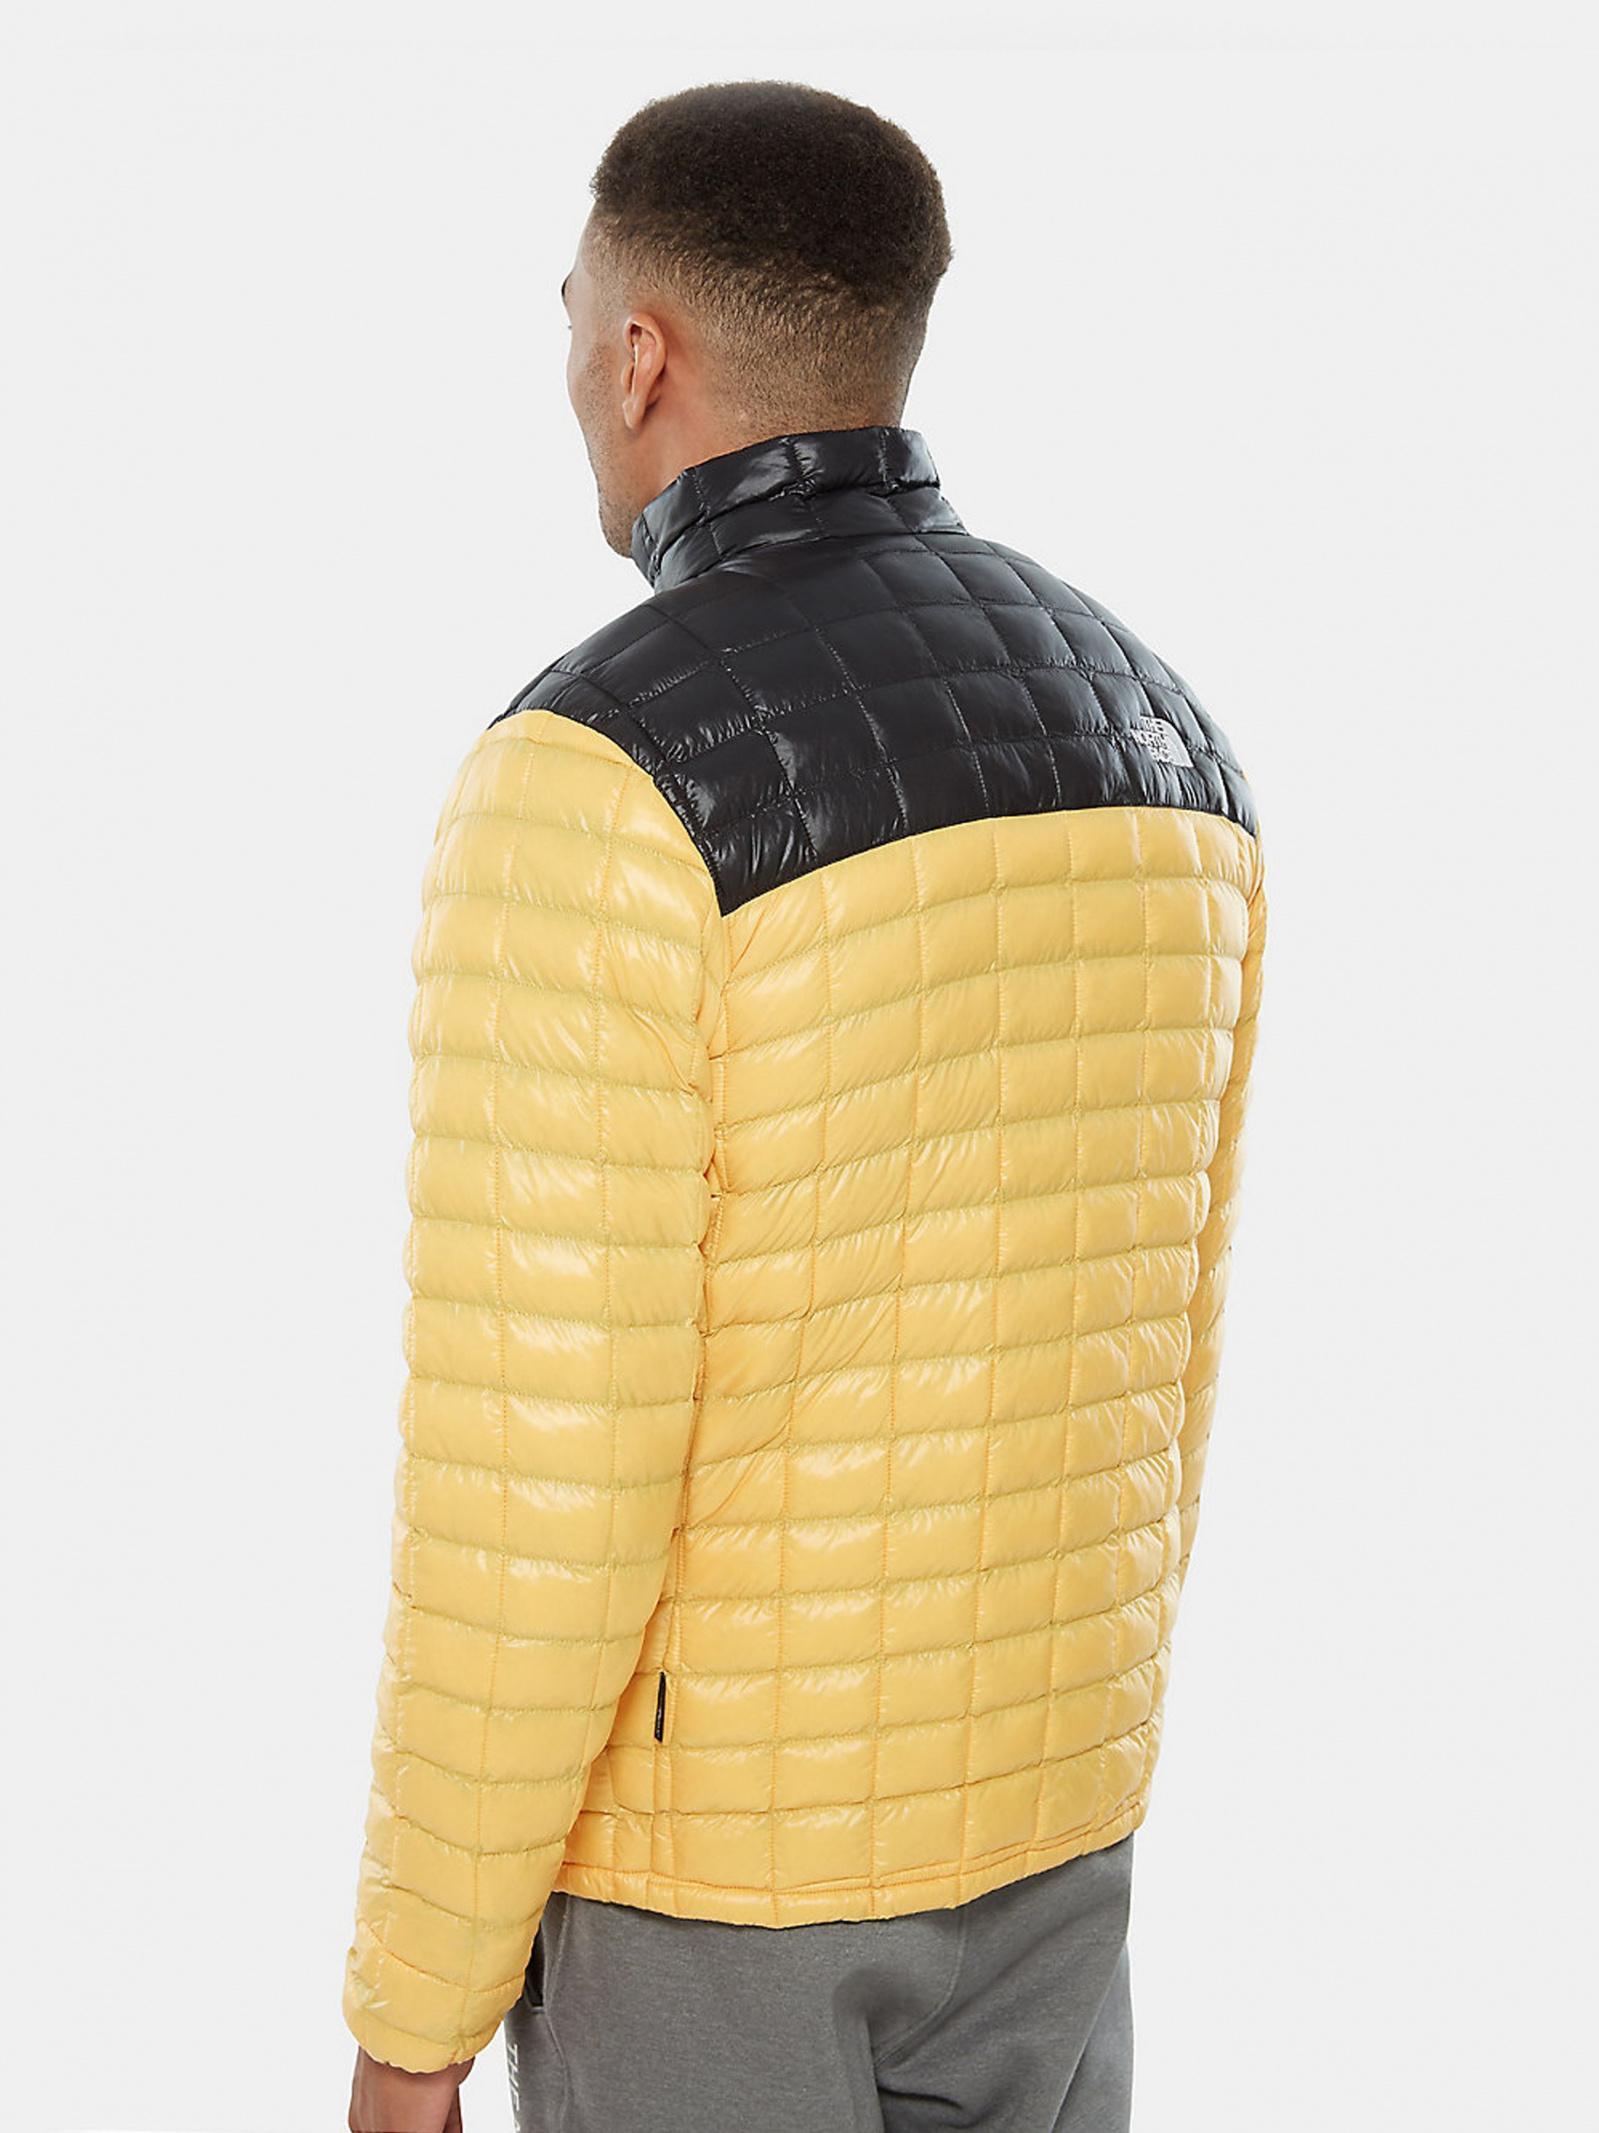 The North Face Куртка чоловічі модель NF0A3Y3NLR01 придбати, 2017